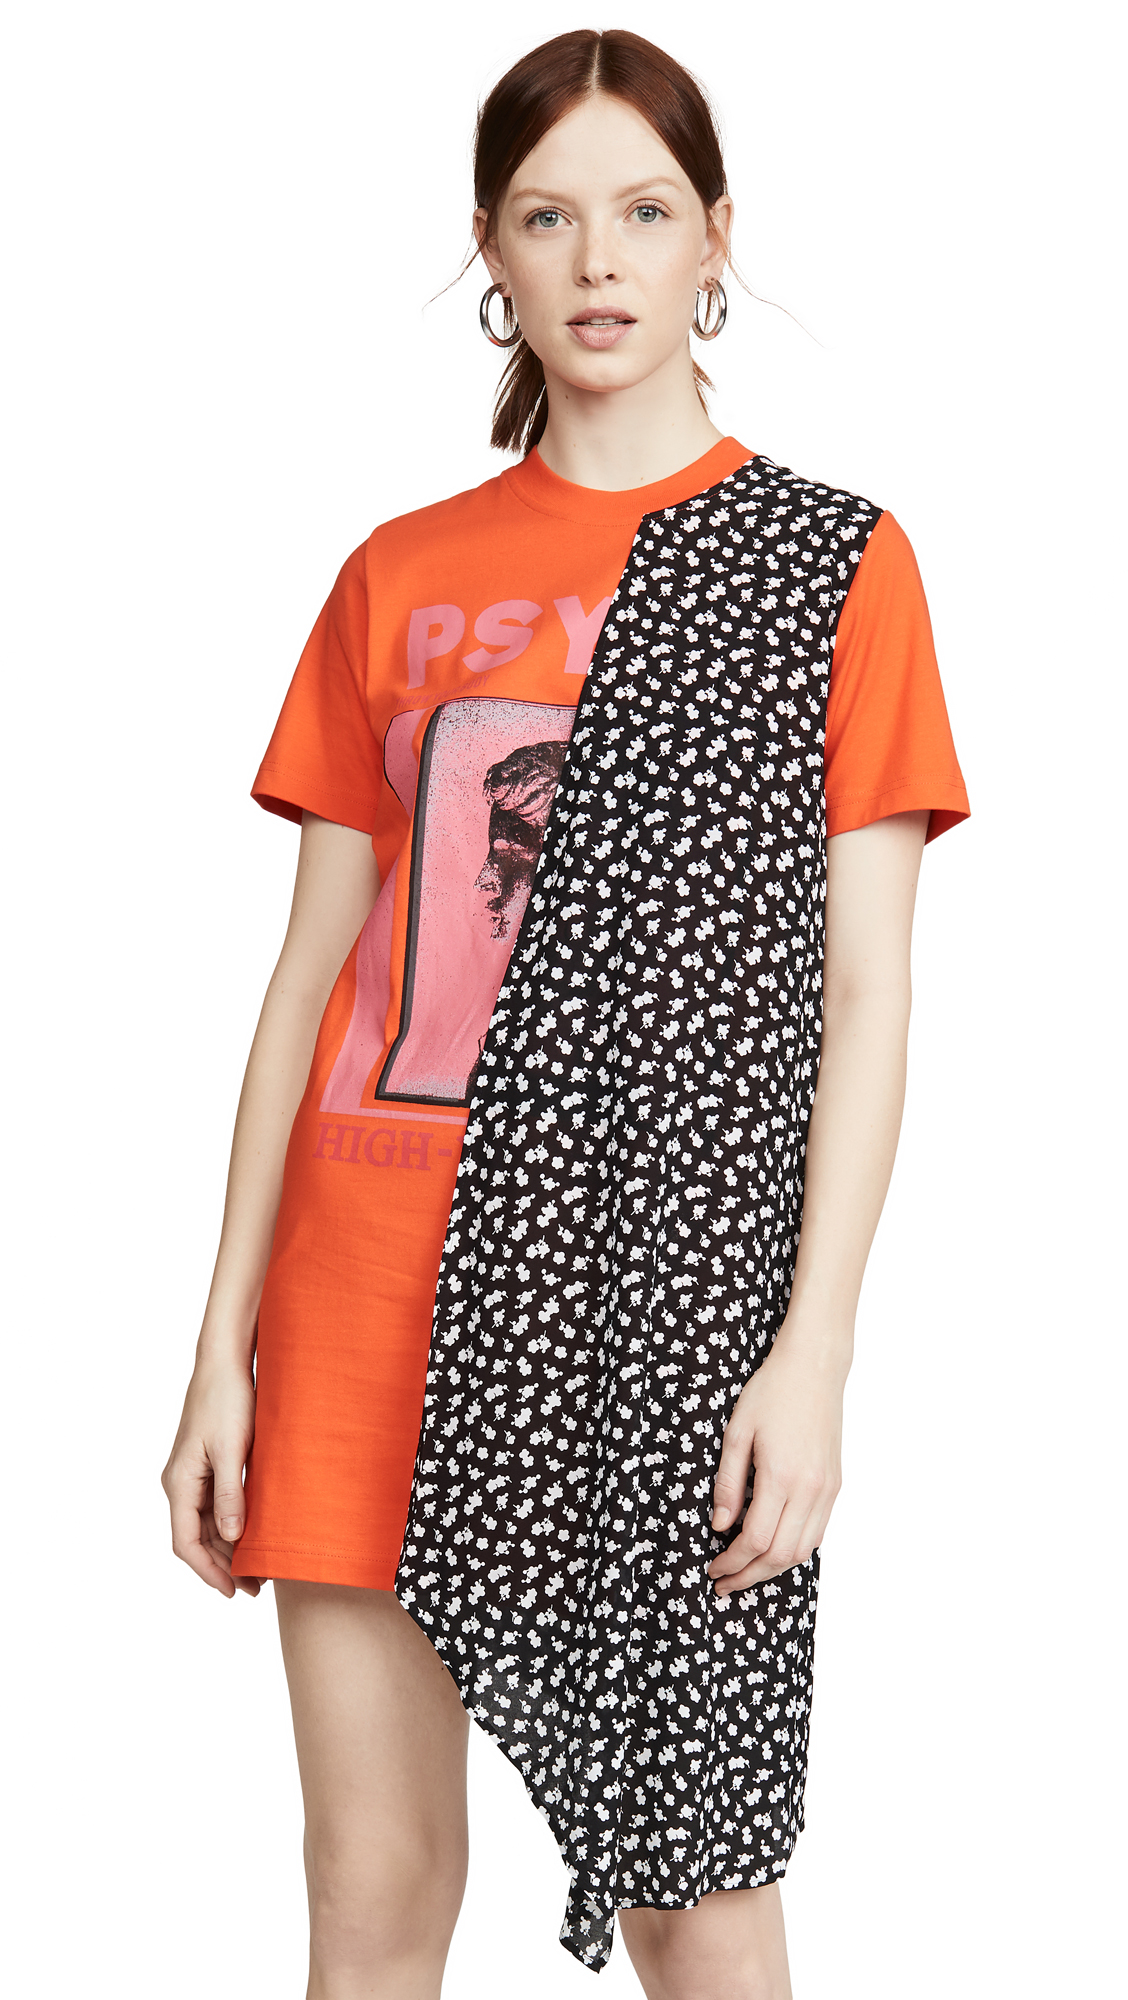 Buy McQ - Alexander McQueen Hybrid Tee Dress online beautiful McQ - Alexander McQueen Clothing, Dresses